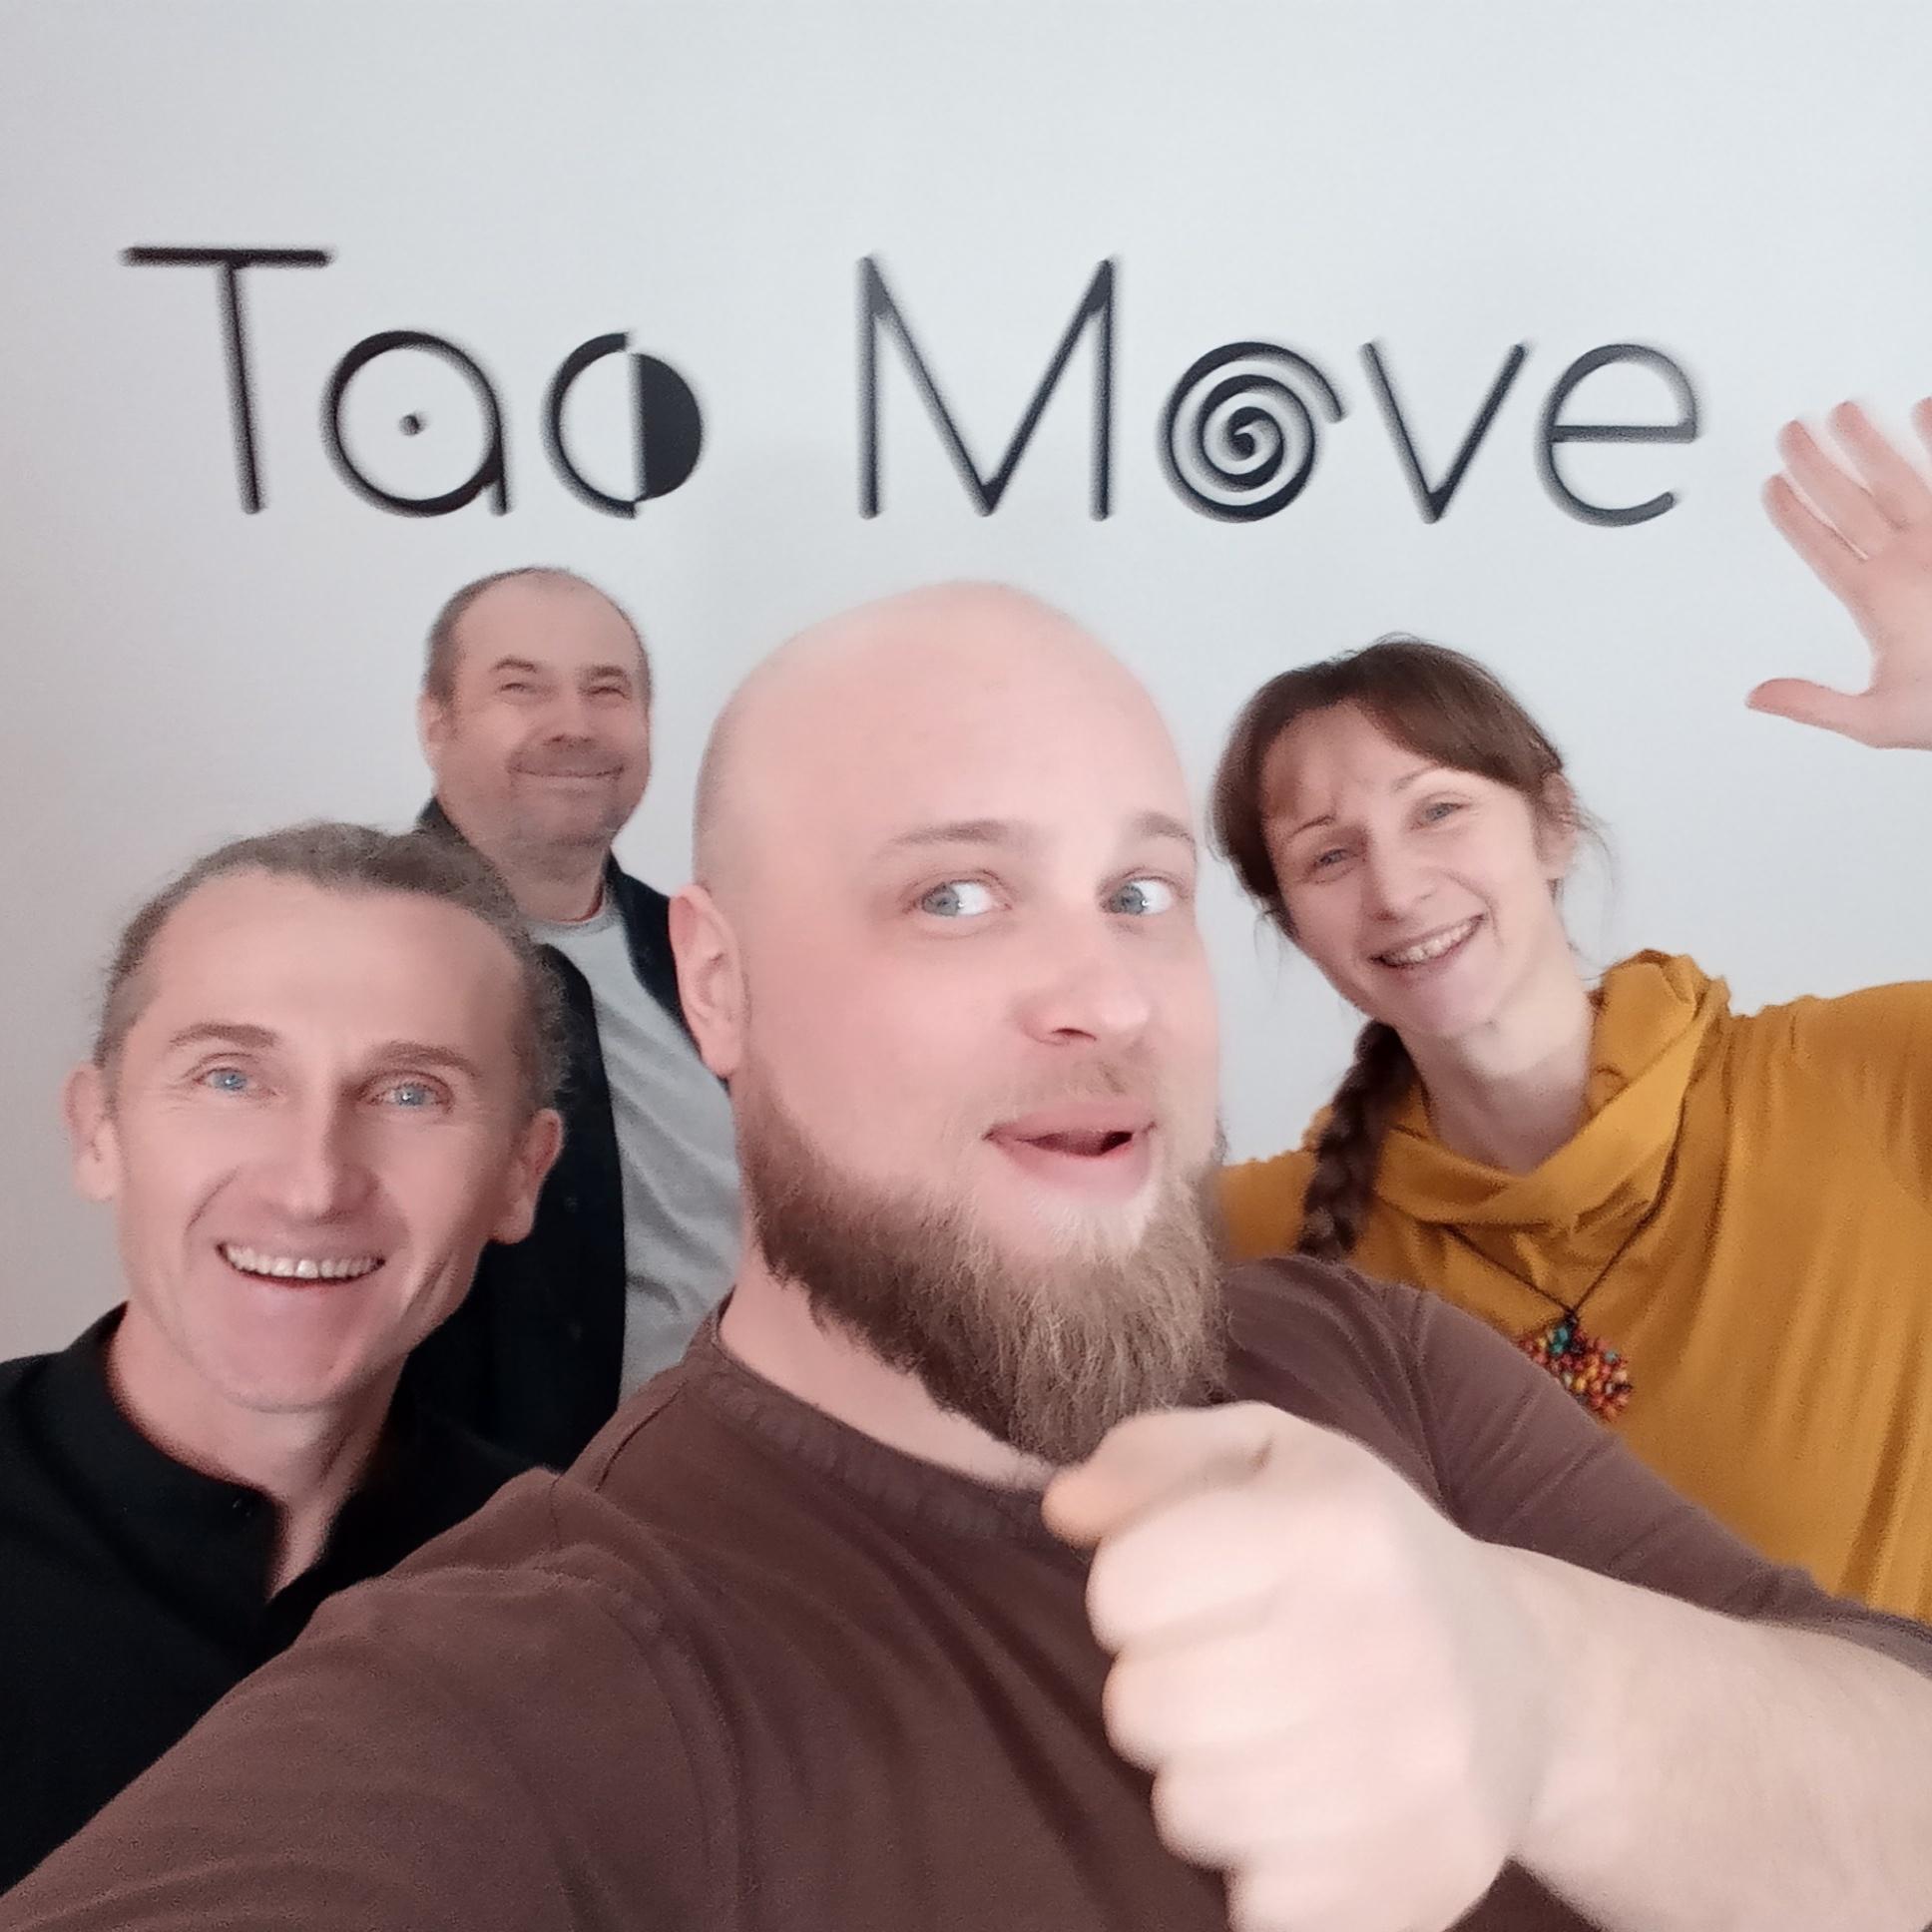 Tao Move